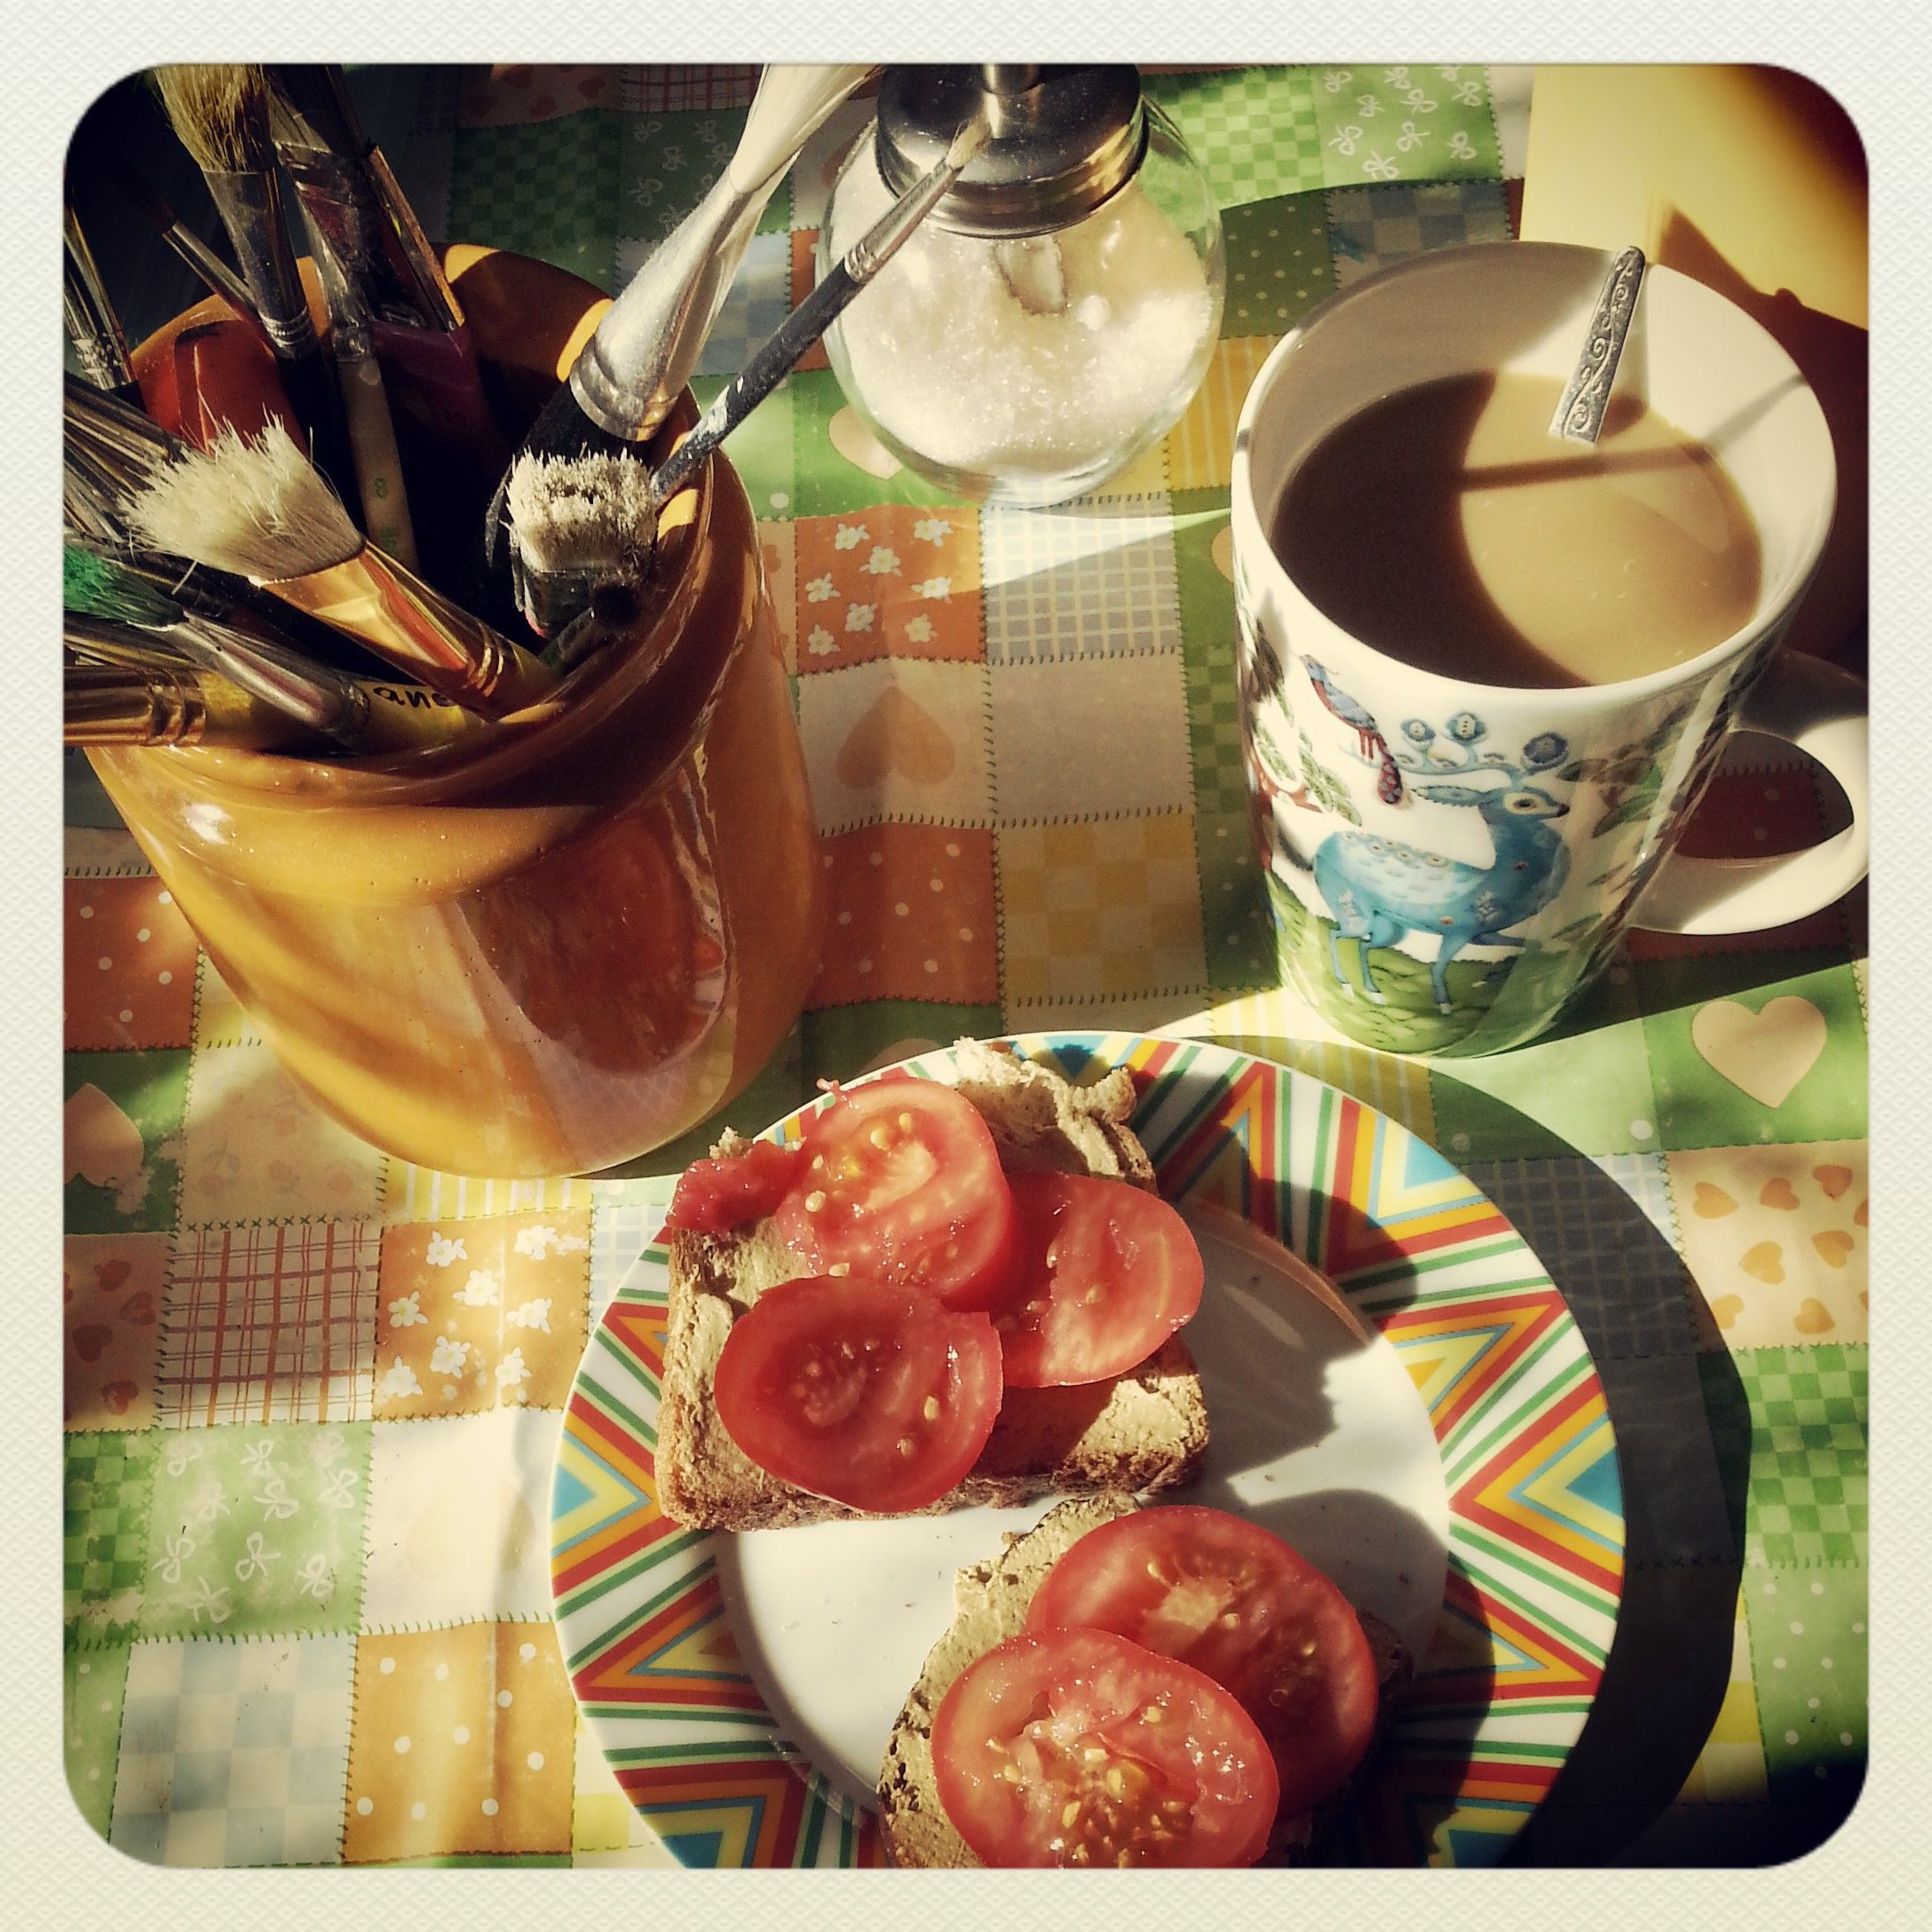 Artsy breakfast. Photo by mademoiselle MAYBEE. August 2013, Estonia.